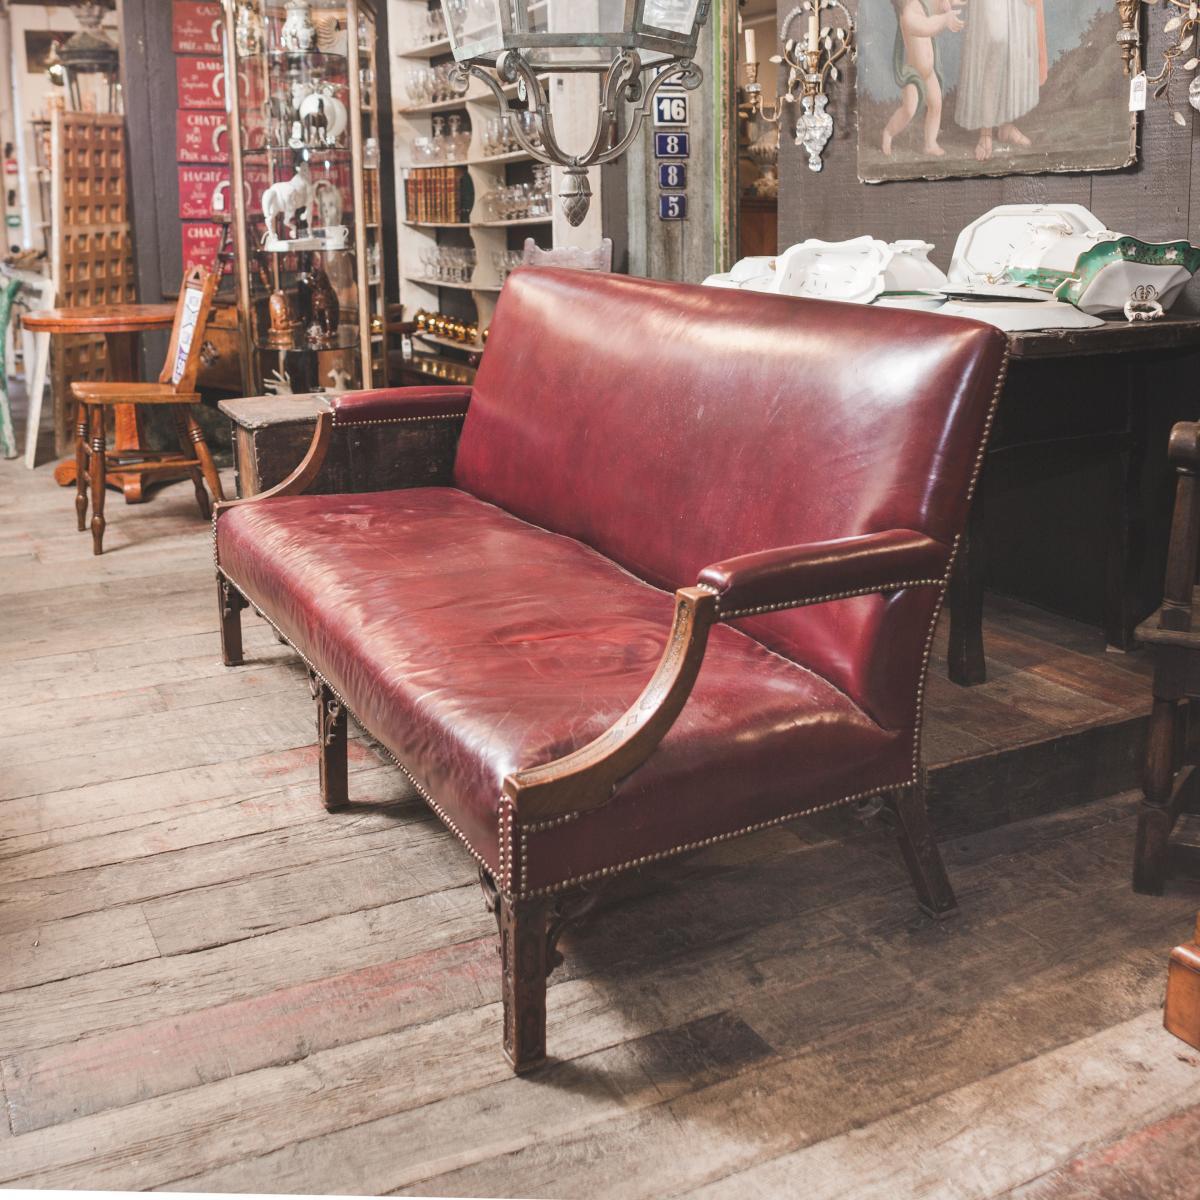 Full Size of Chippendale Sofa Style Table Furniture For Sale Reproduction Slipcover Uk Leather Bada Stoff Grau Polster Benz Kaufen Günstig Muuto Heimkino Freistil Auf Sofa Chippendale Sofa